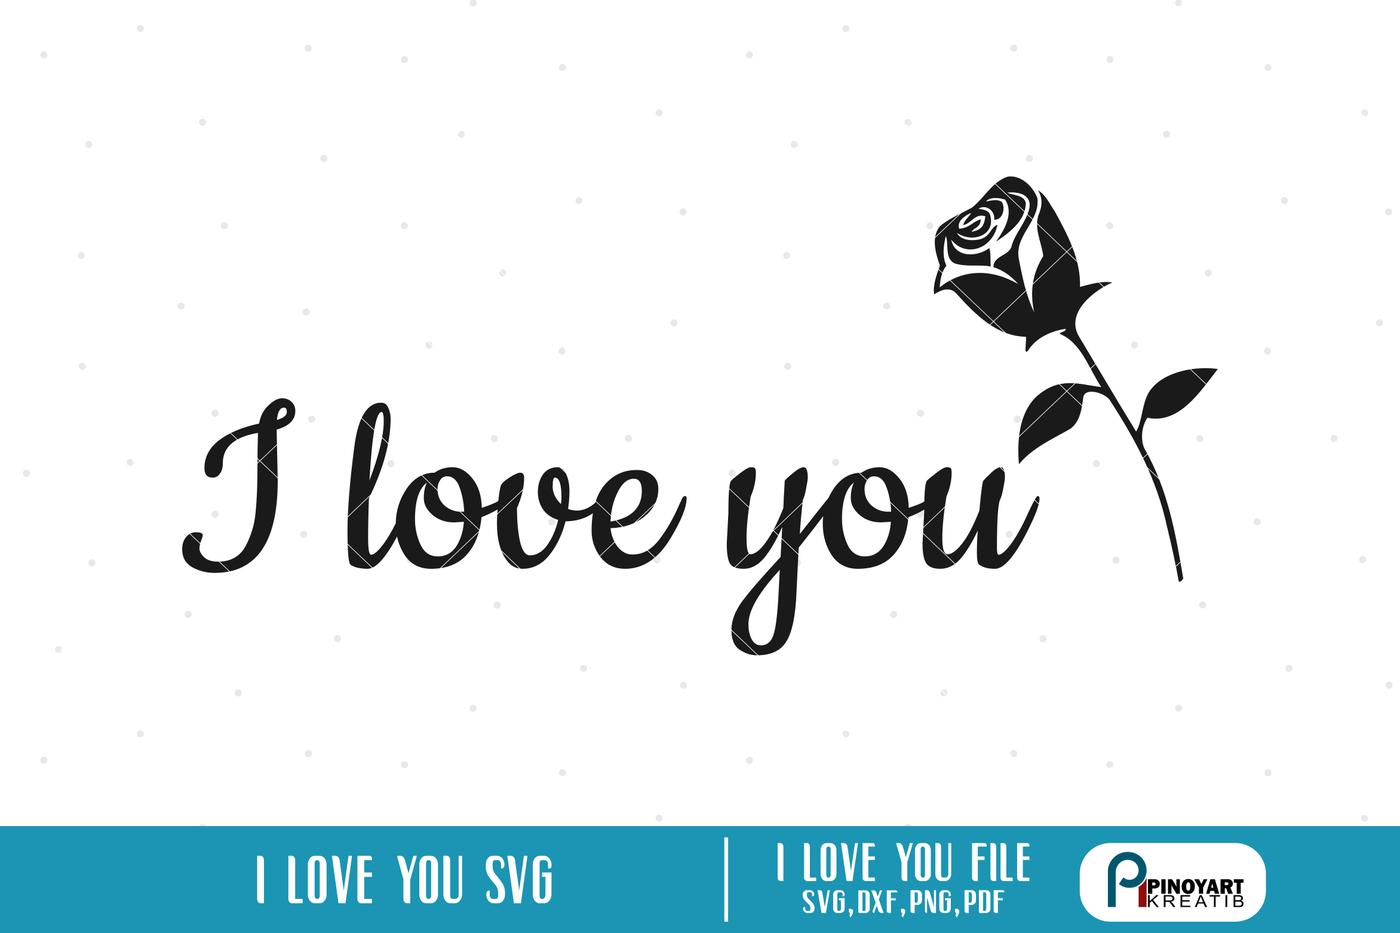 I Love You Svg I Love You Svg File I Love You Dxf Valentines Svg